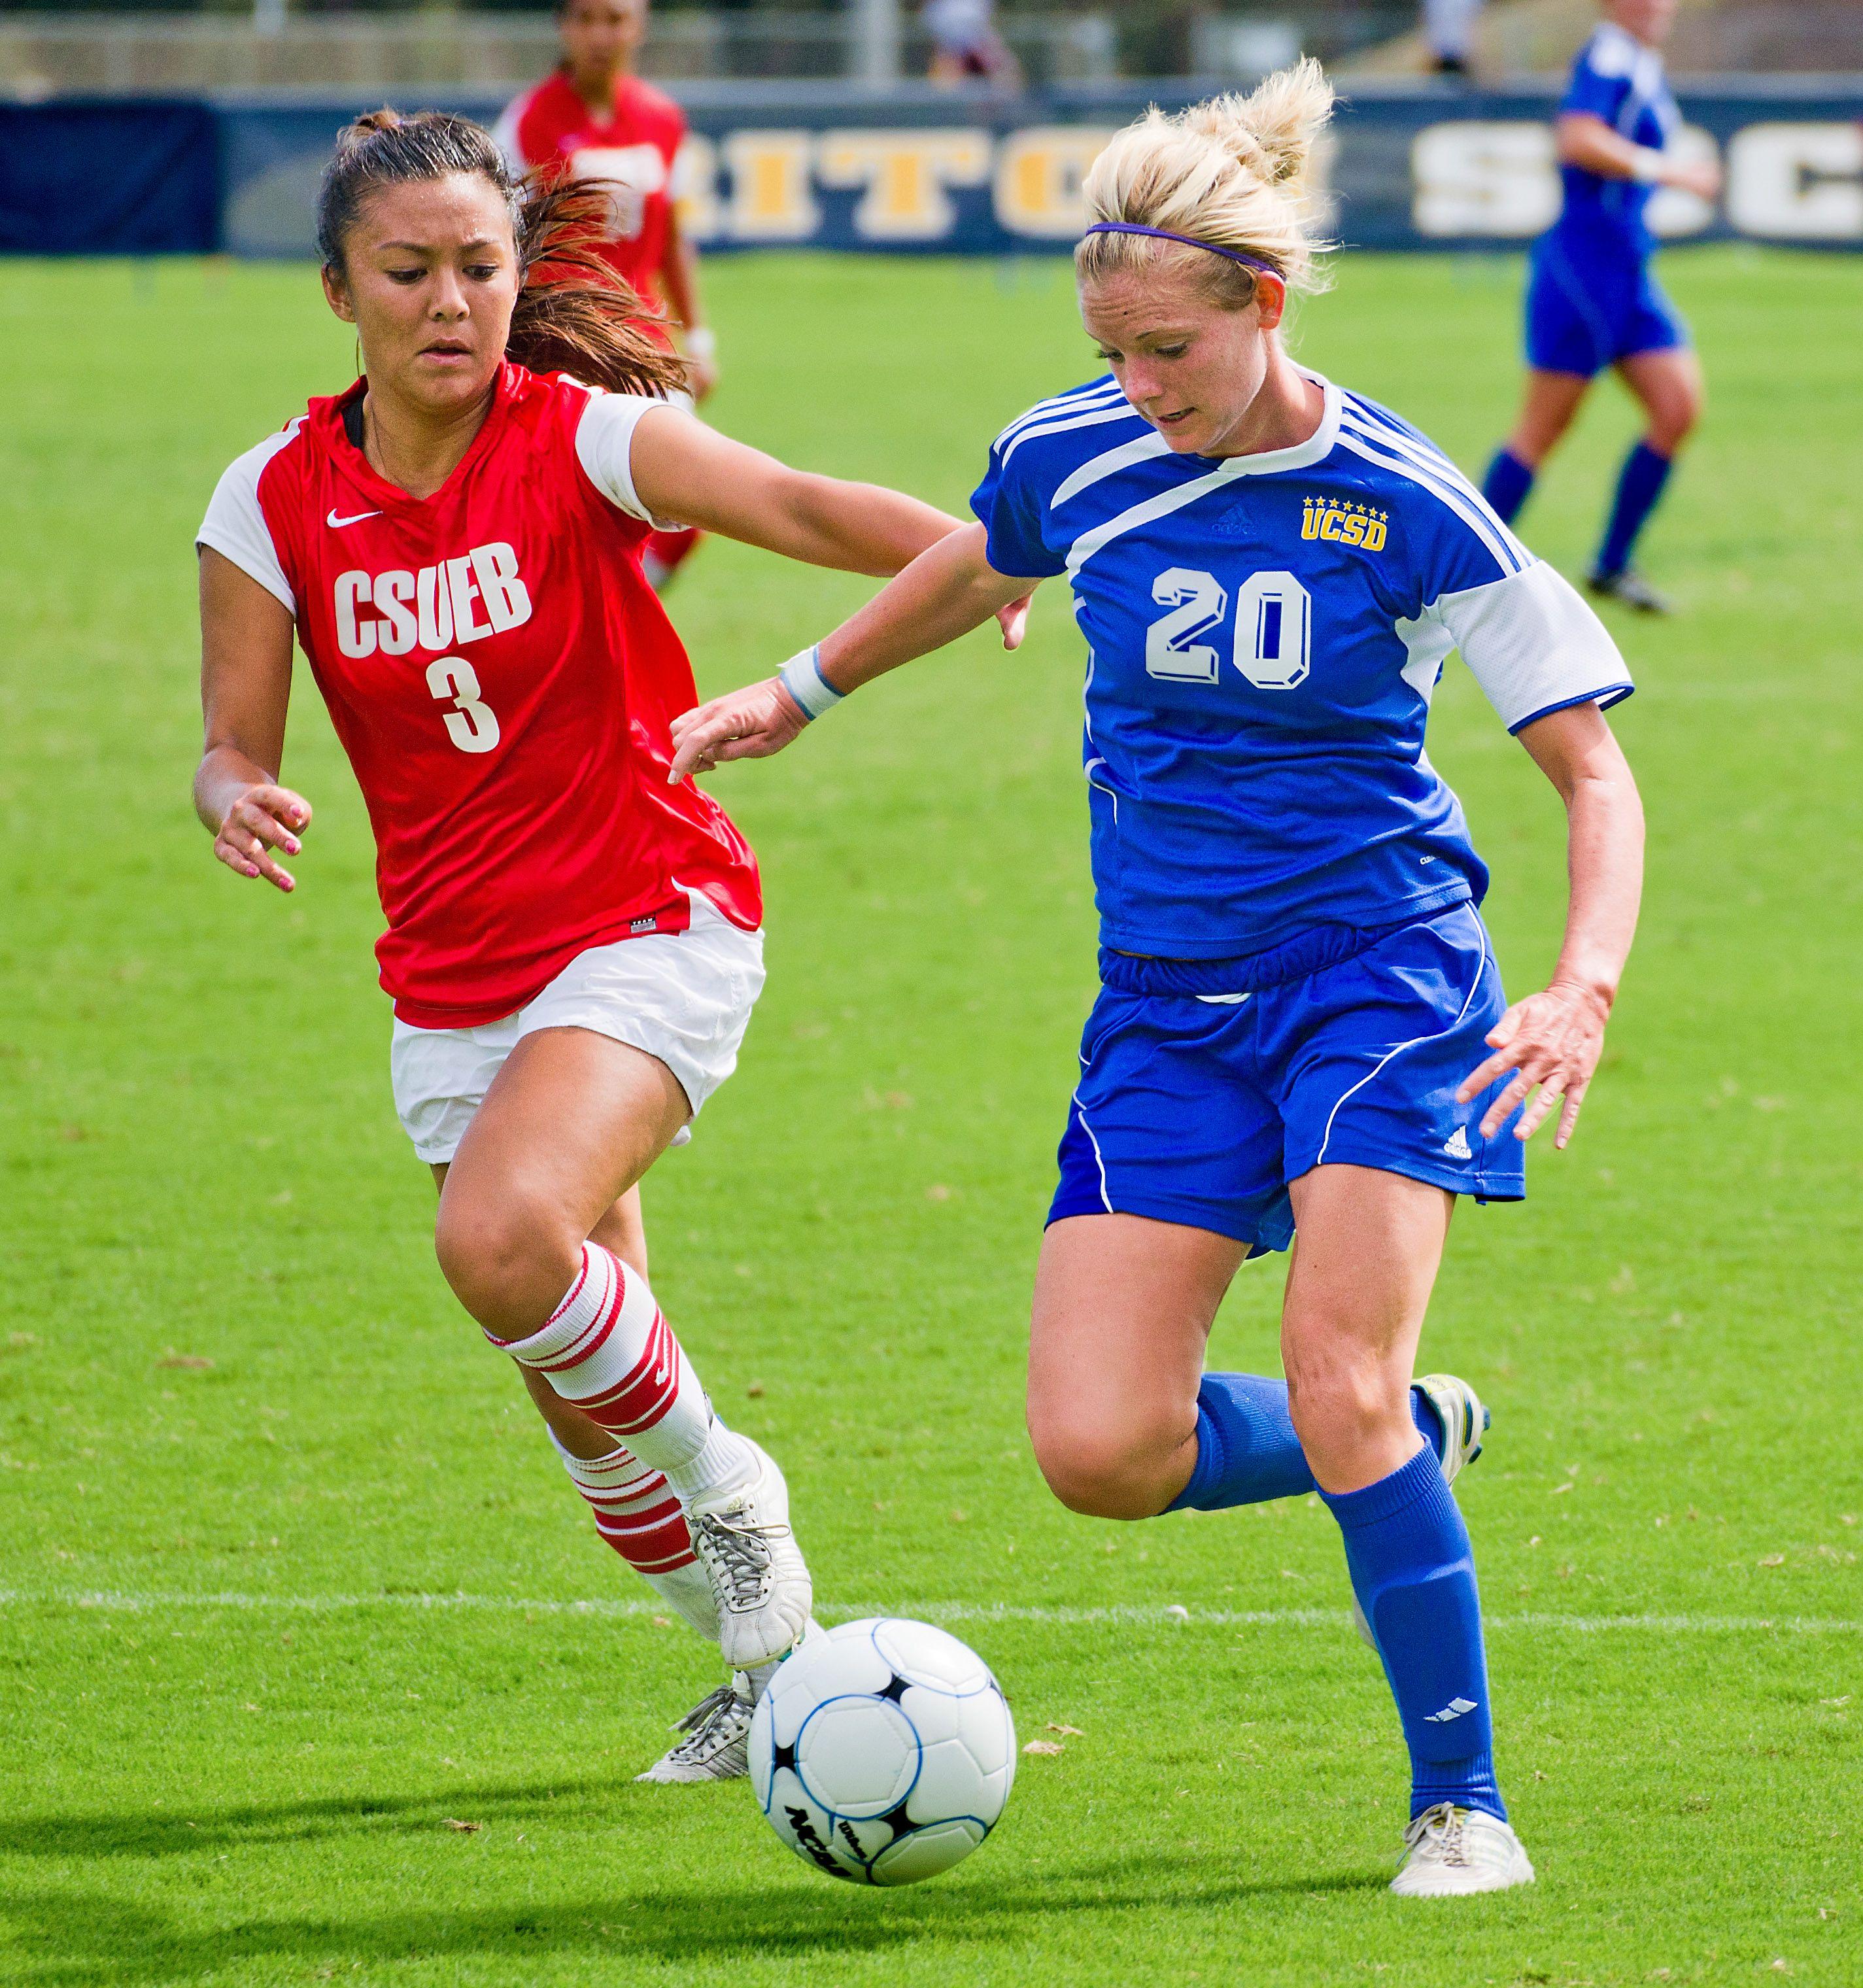 Washington State Soccer Camps 2014 For Girls Soccer